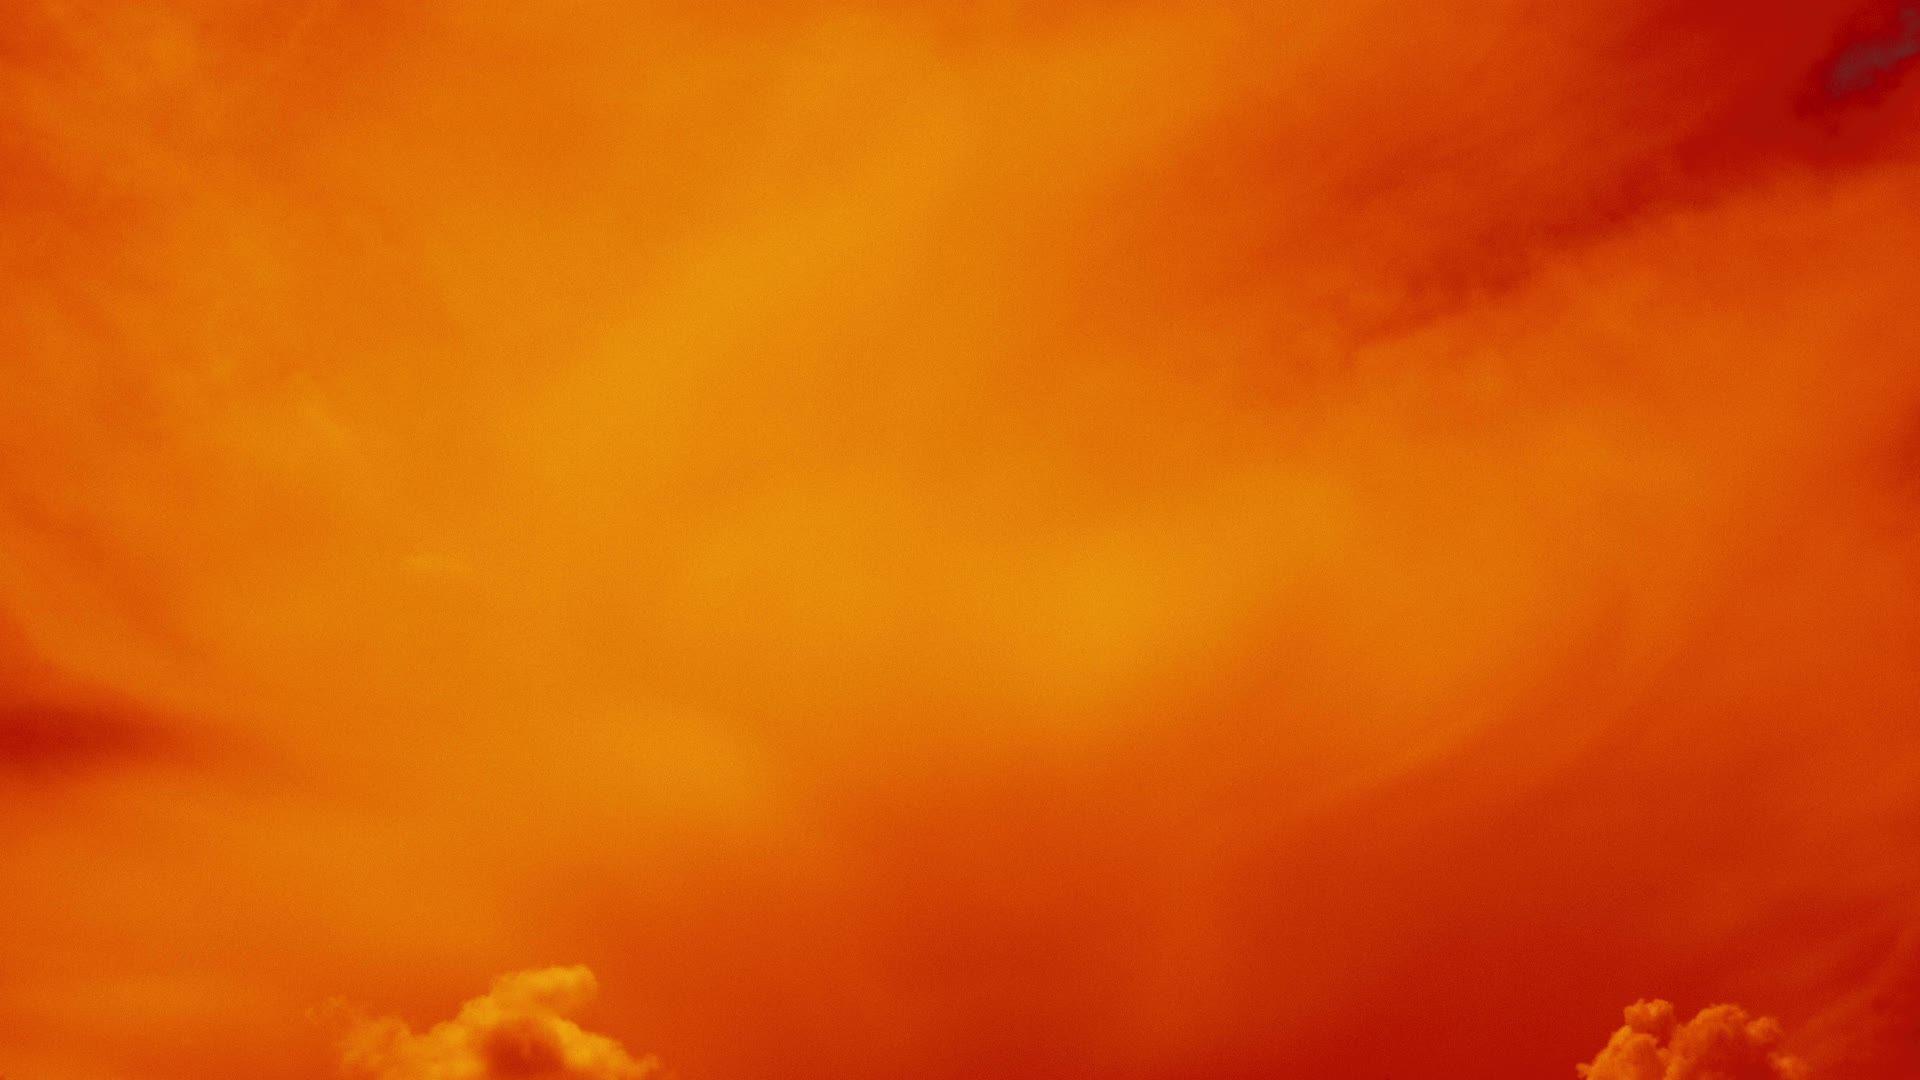 Fondos Abstractos Naranja Para Fondo Celular En Hd 16 HD